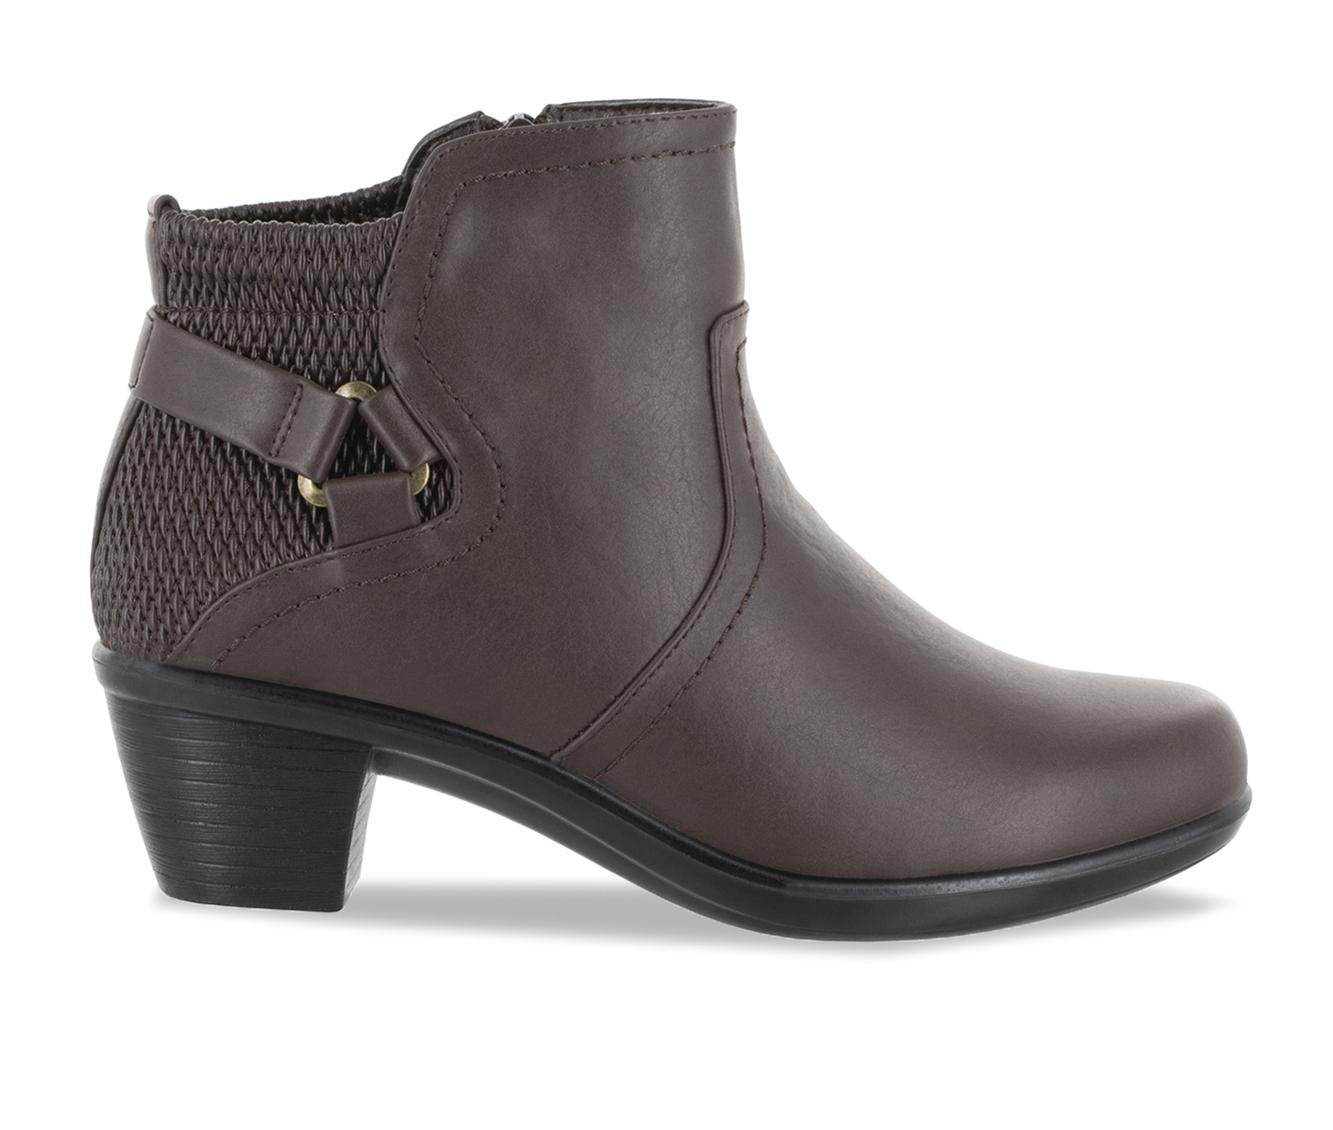 Easy Street Dawnta Women's Boots (Brown - Faux Leather)